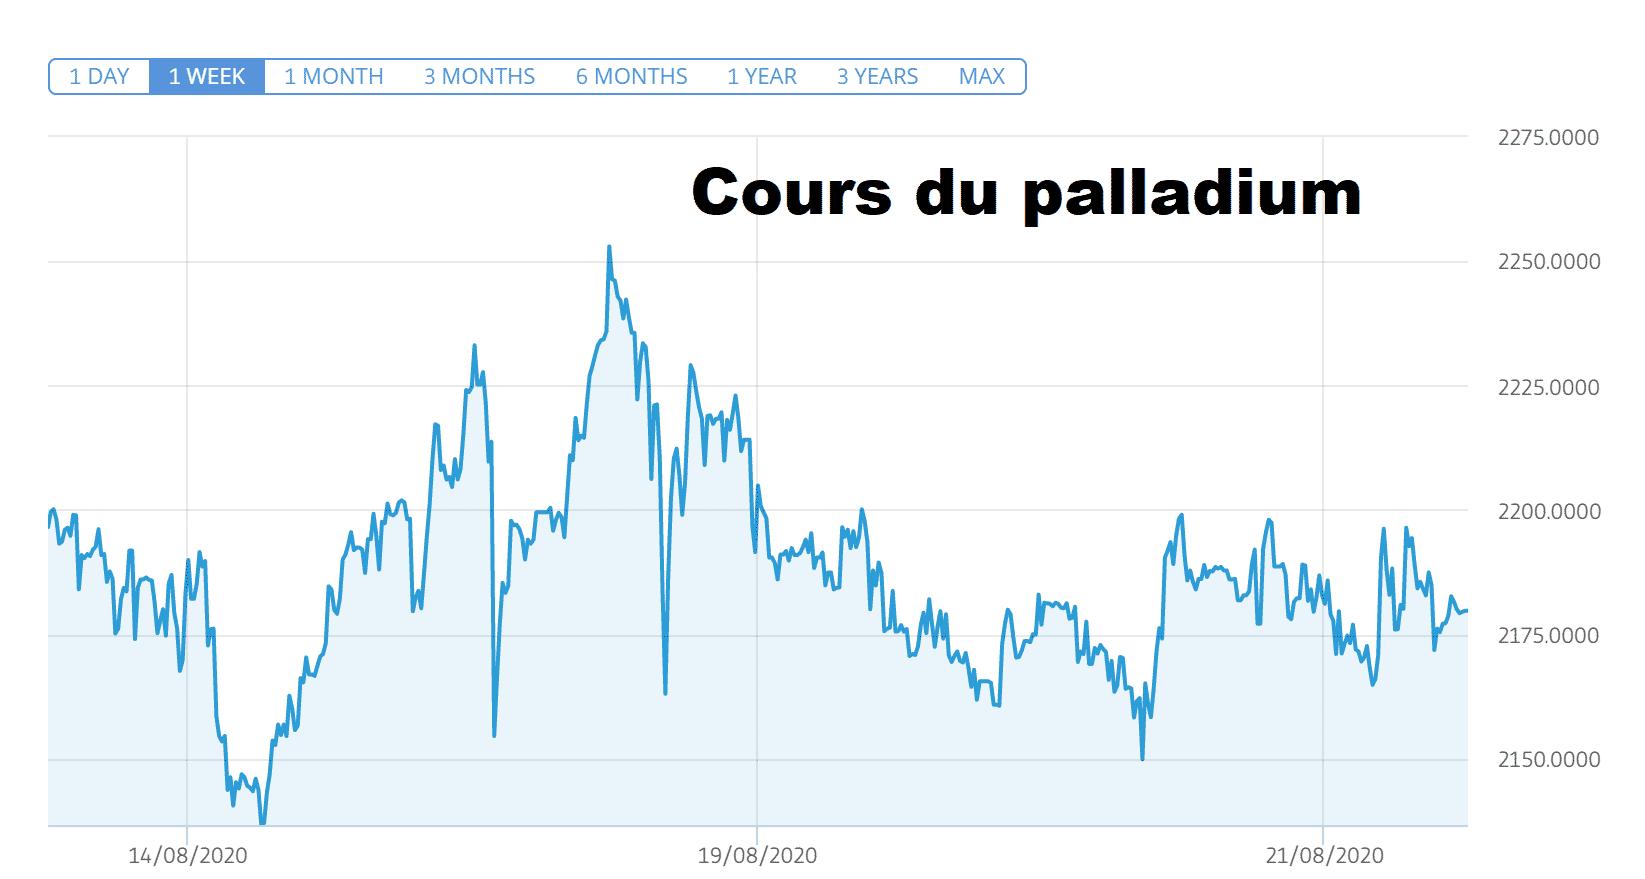 cours platine palladium explose or record surplace.